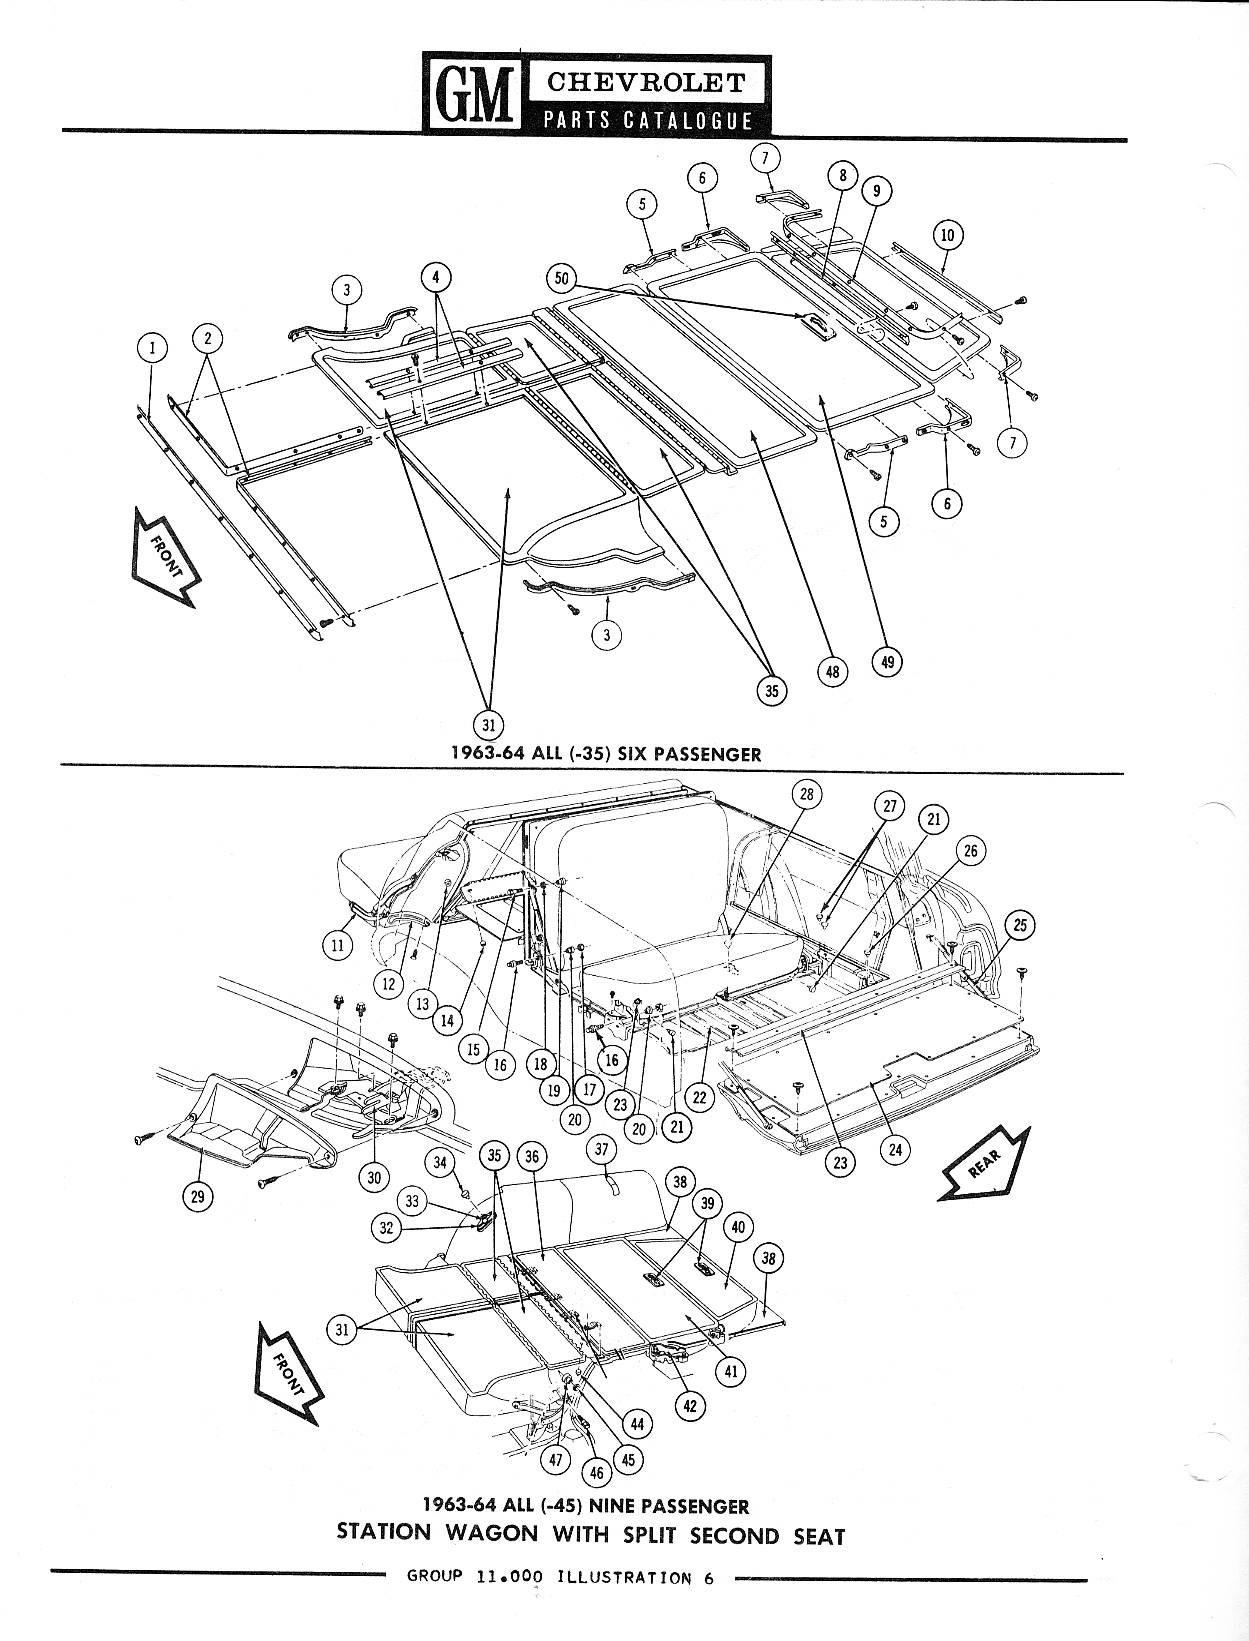 1958-1968 Chevrolet Parts Catalog / Image149.jpg